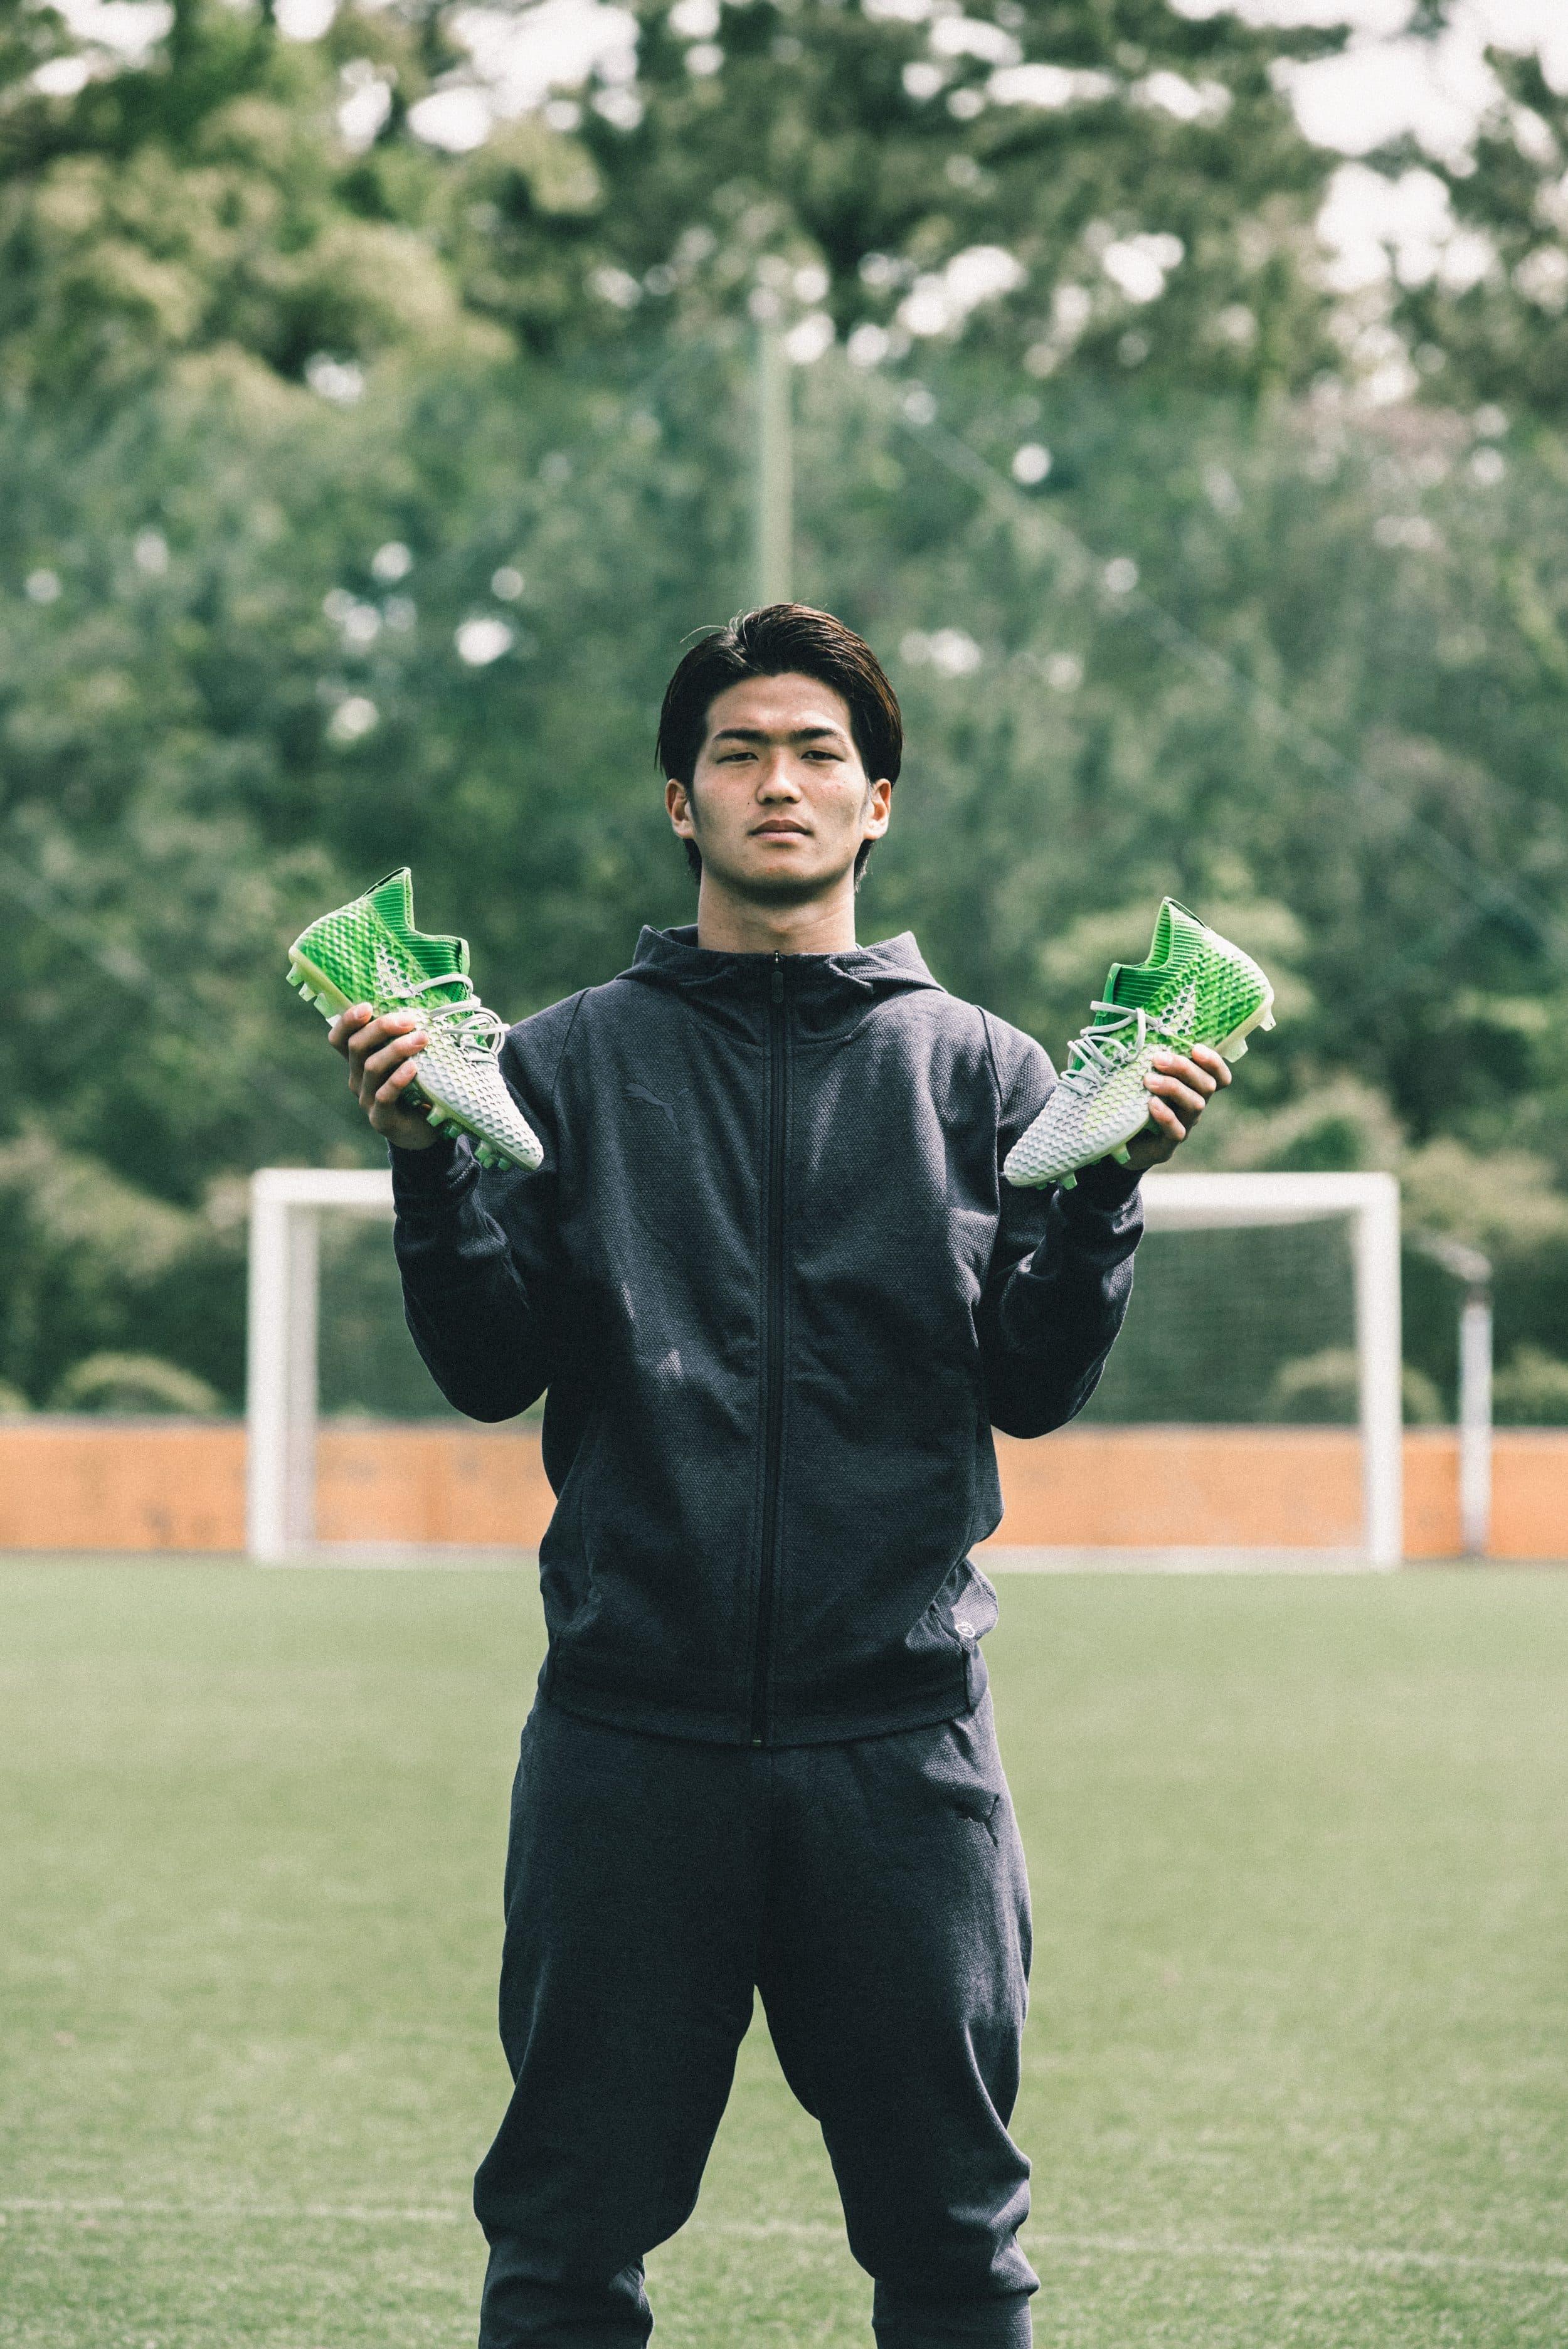 Chaussures-football-puma-future-next-kitagawa-mai-2018